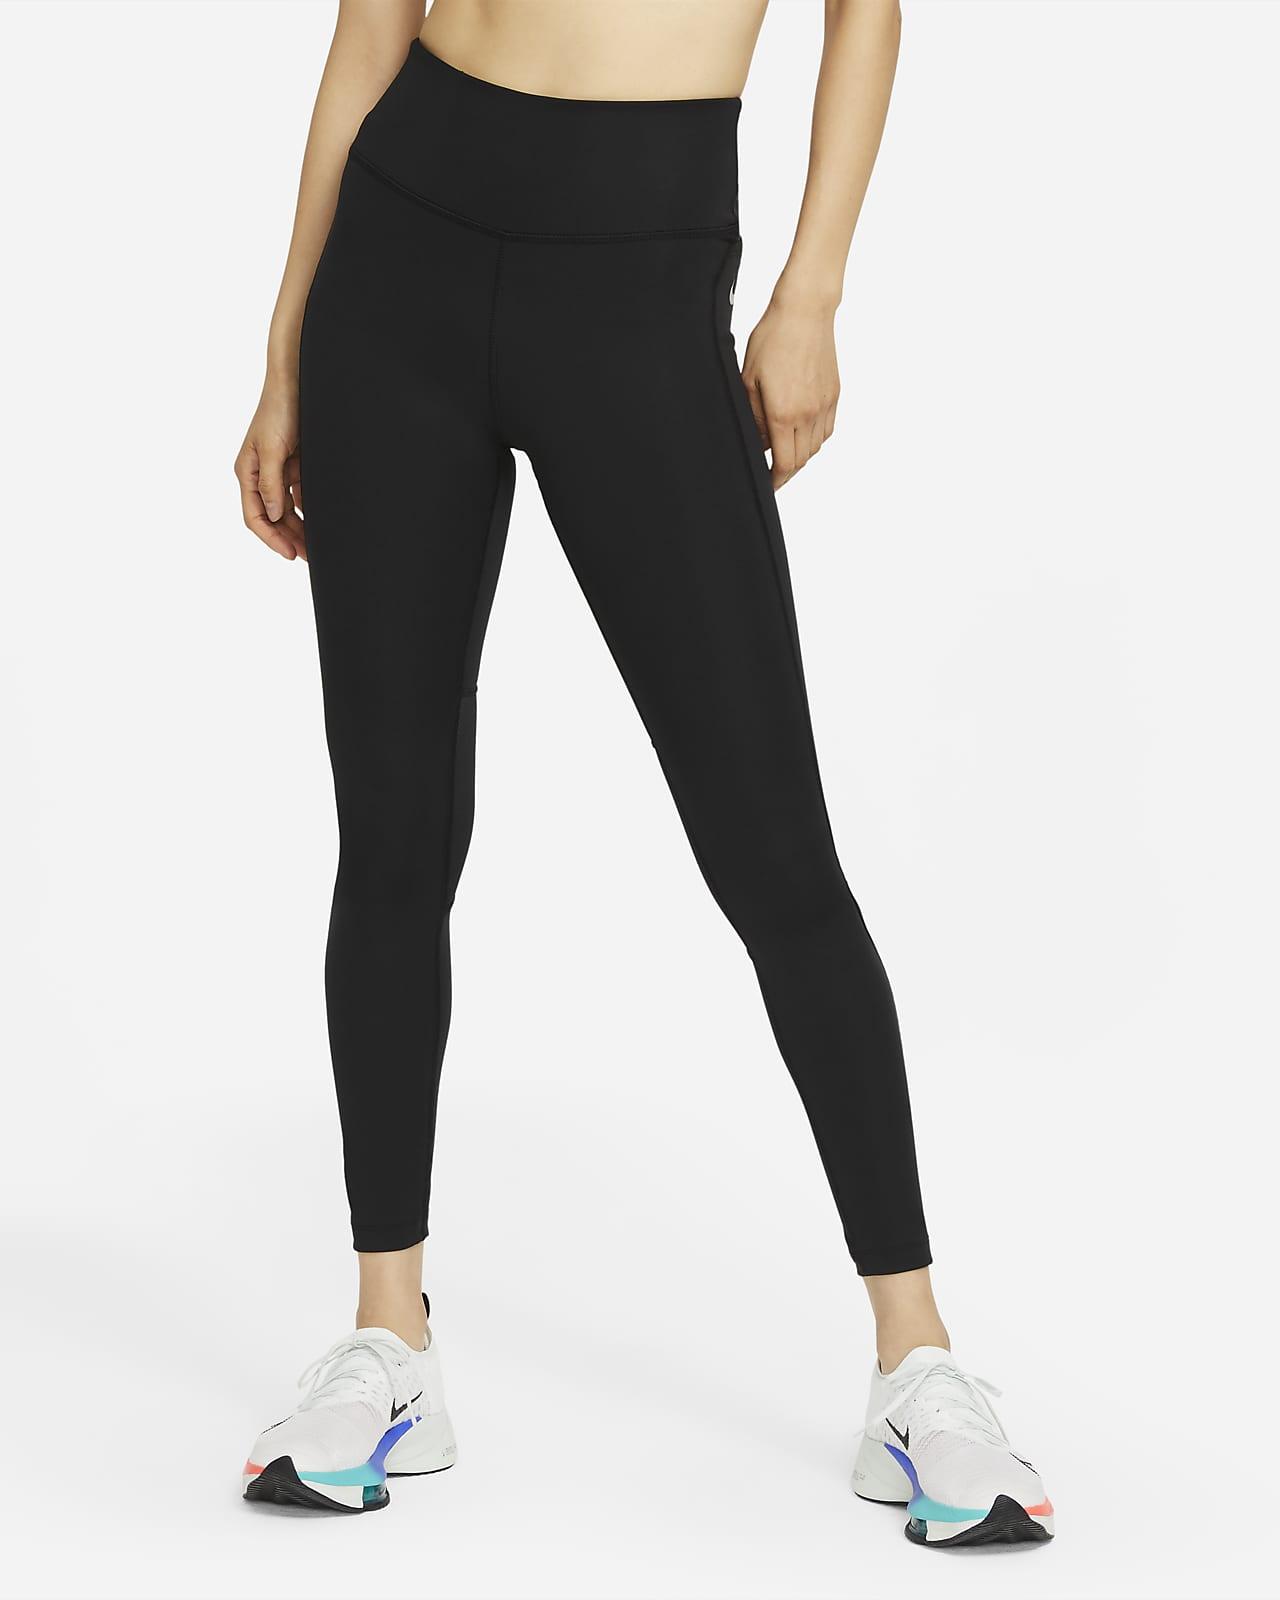 Legging de running taille mi-haute Nike Epic Fast pour Femme